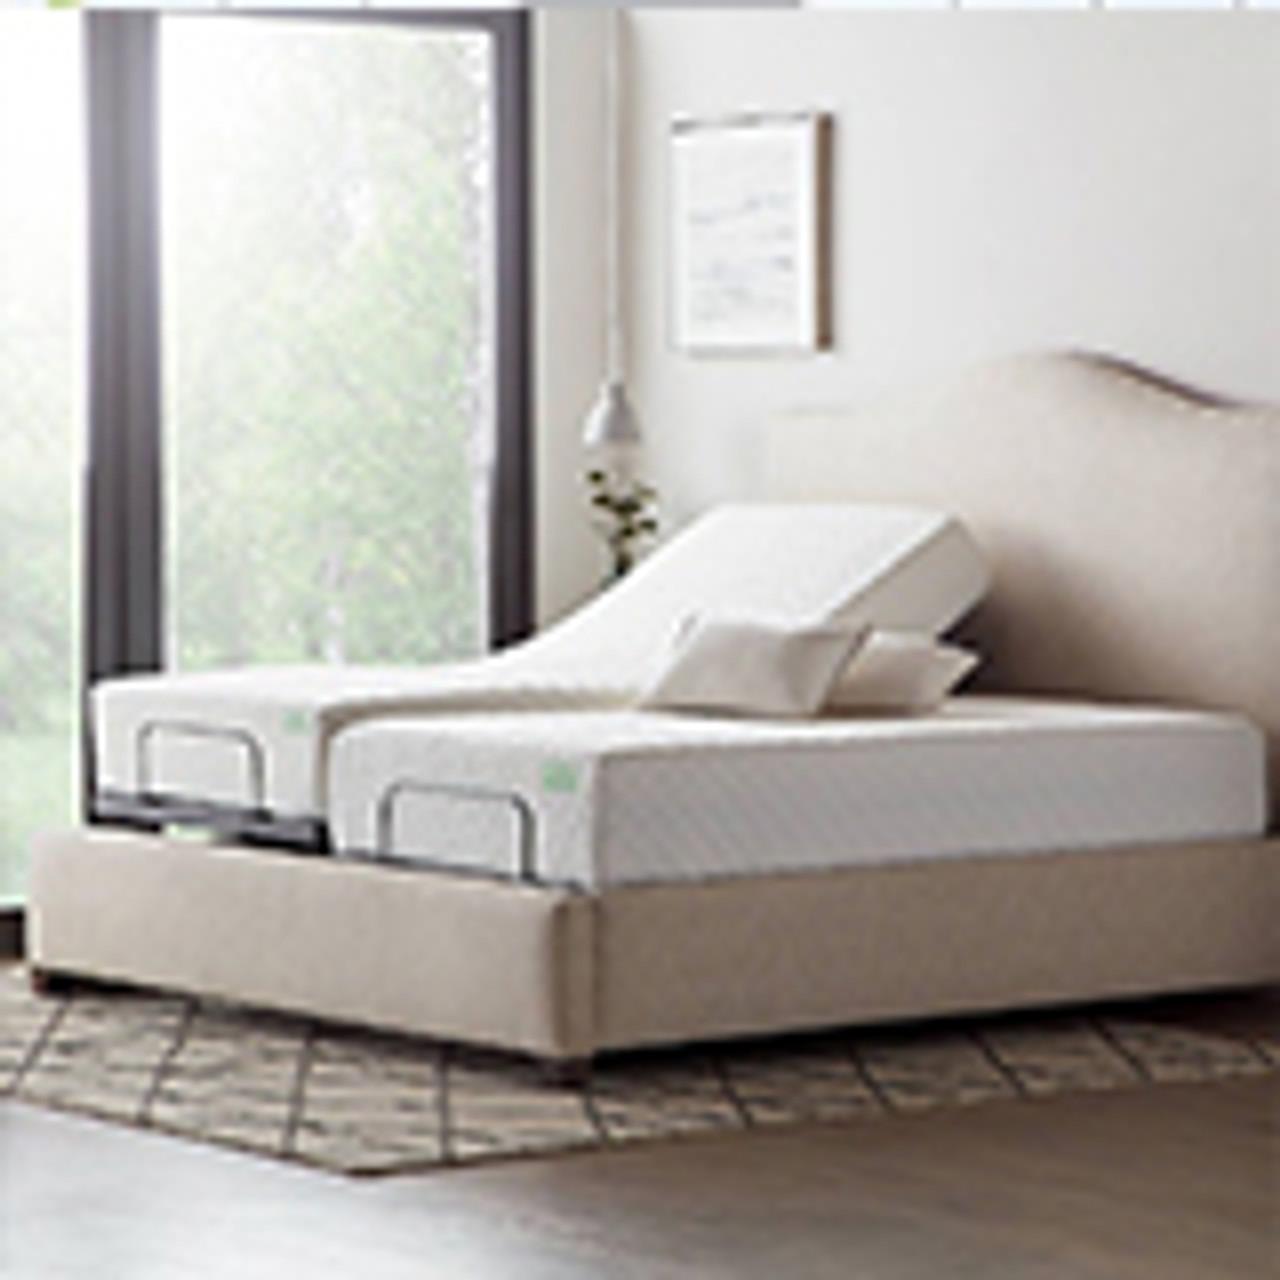 Adjustable Bed and Mattress Bundle